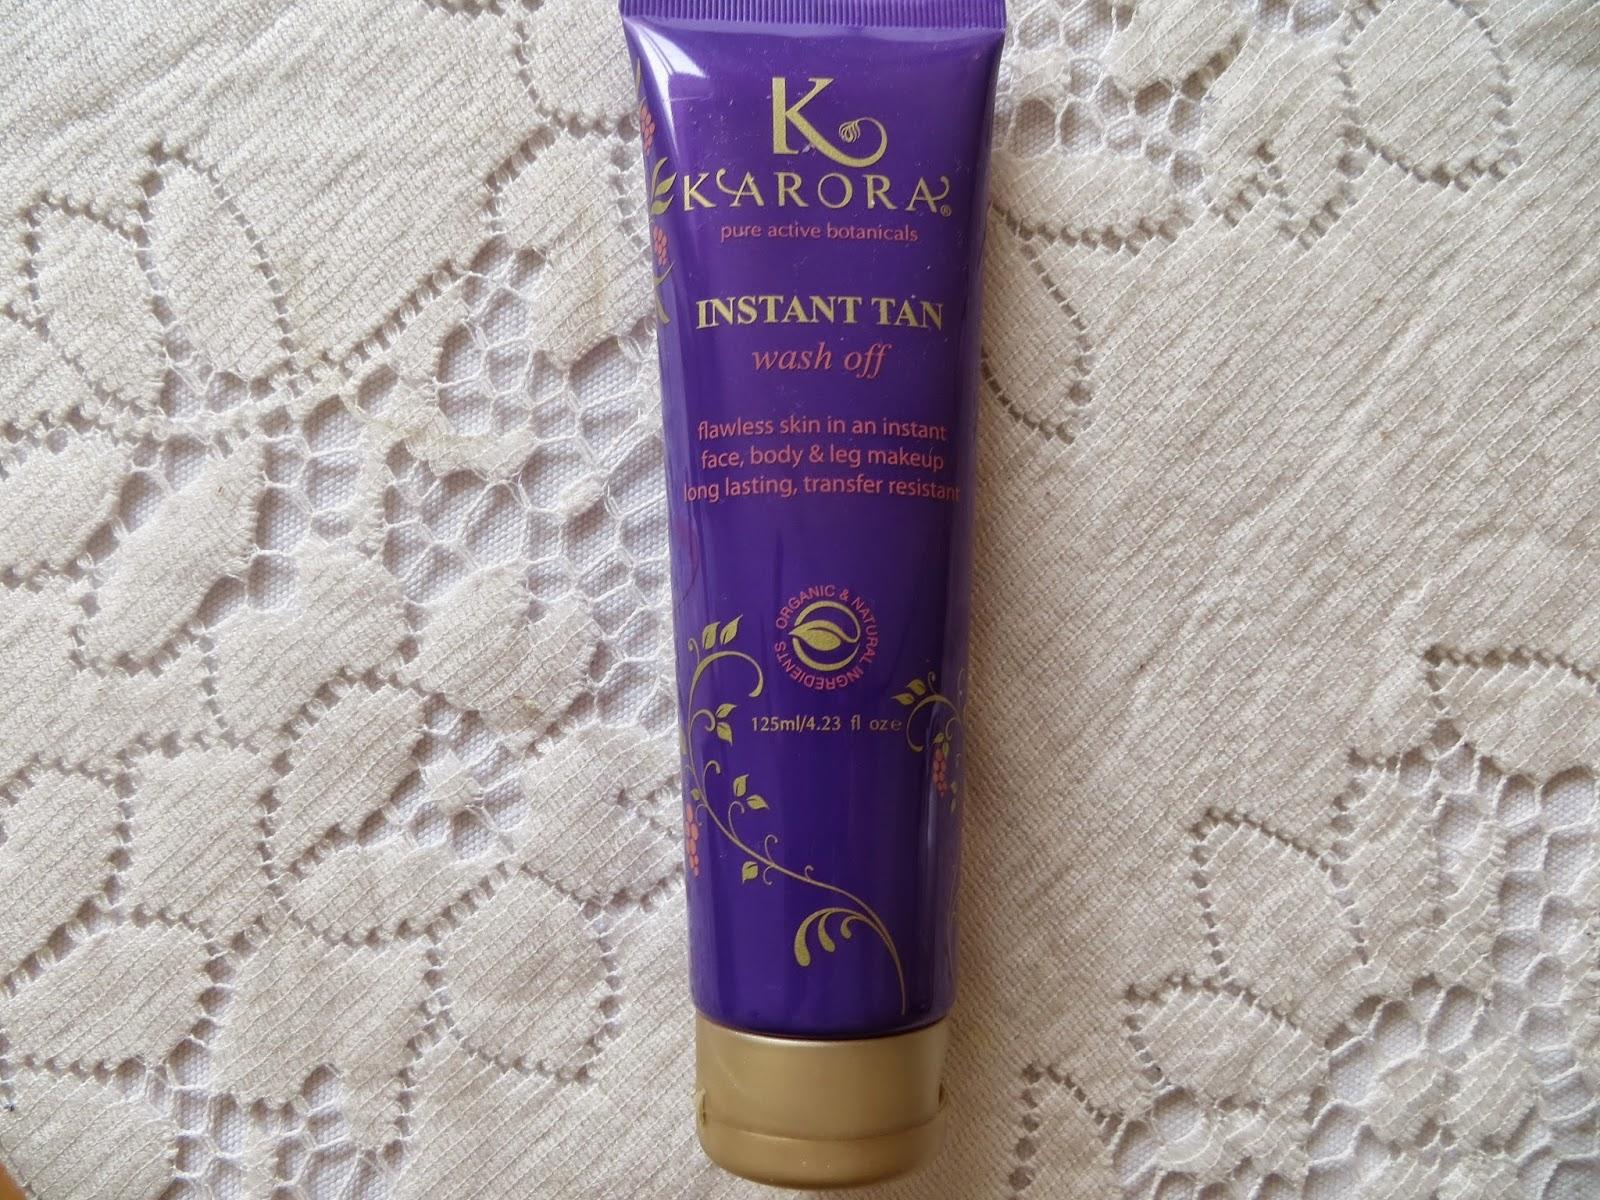 Karora, Self tan, fake tan, Karora review, Argan oil, Review, Instant tan, swatch, test